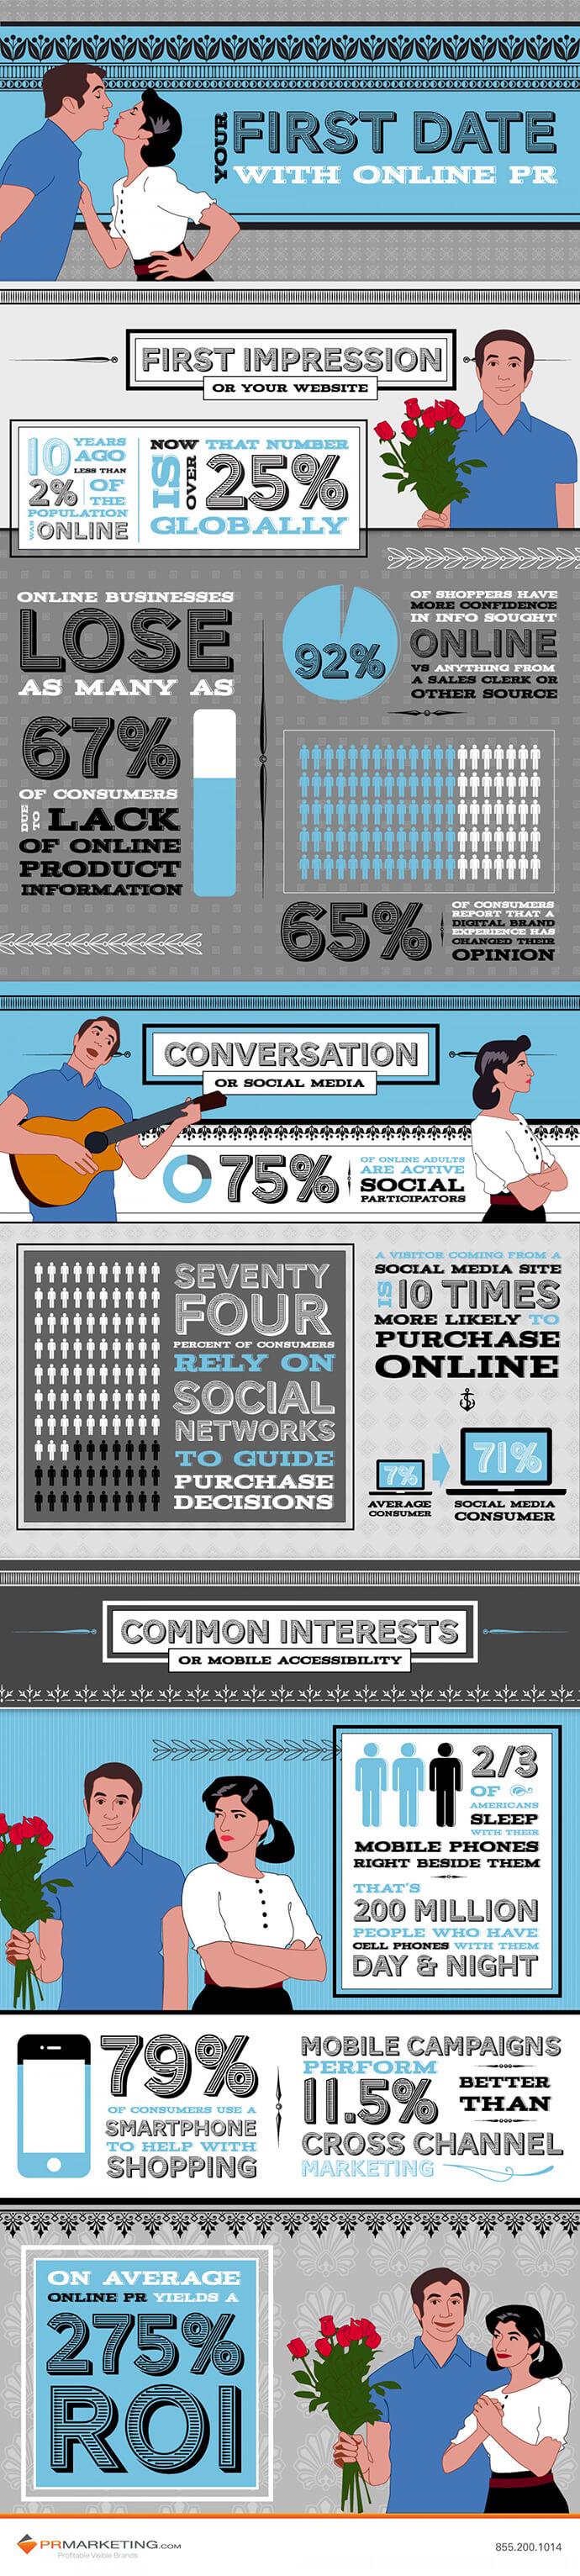 infografic relațiile publice online